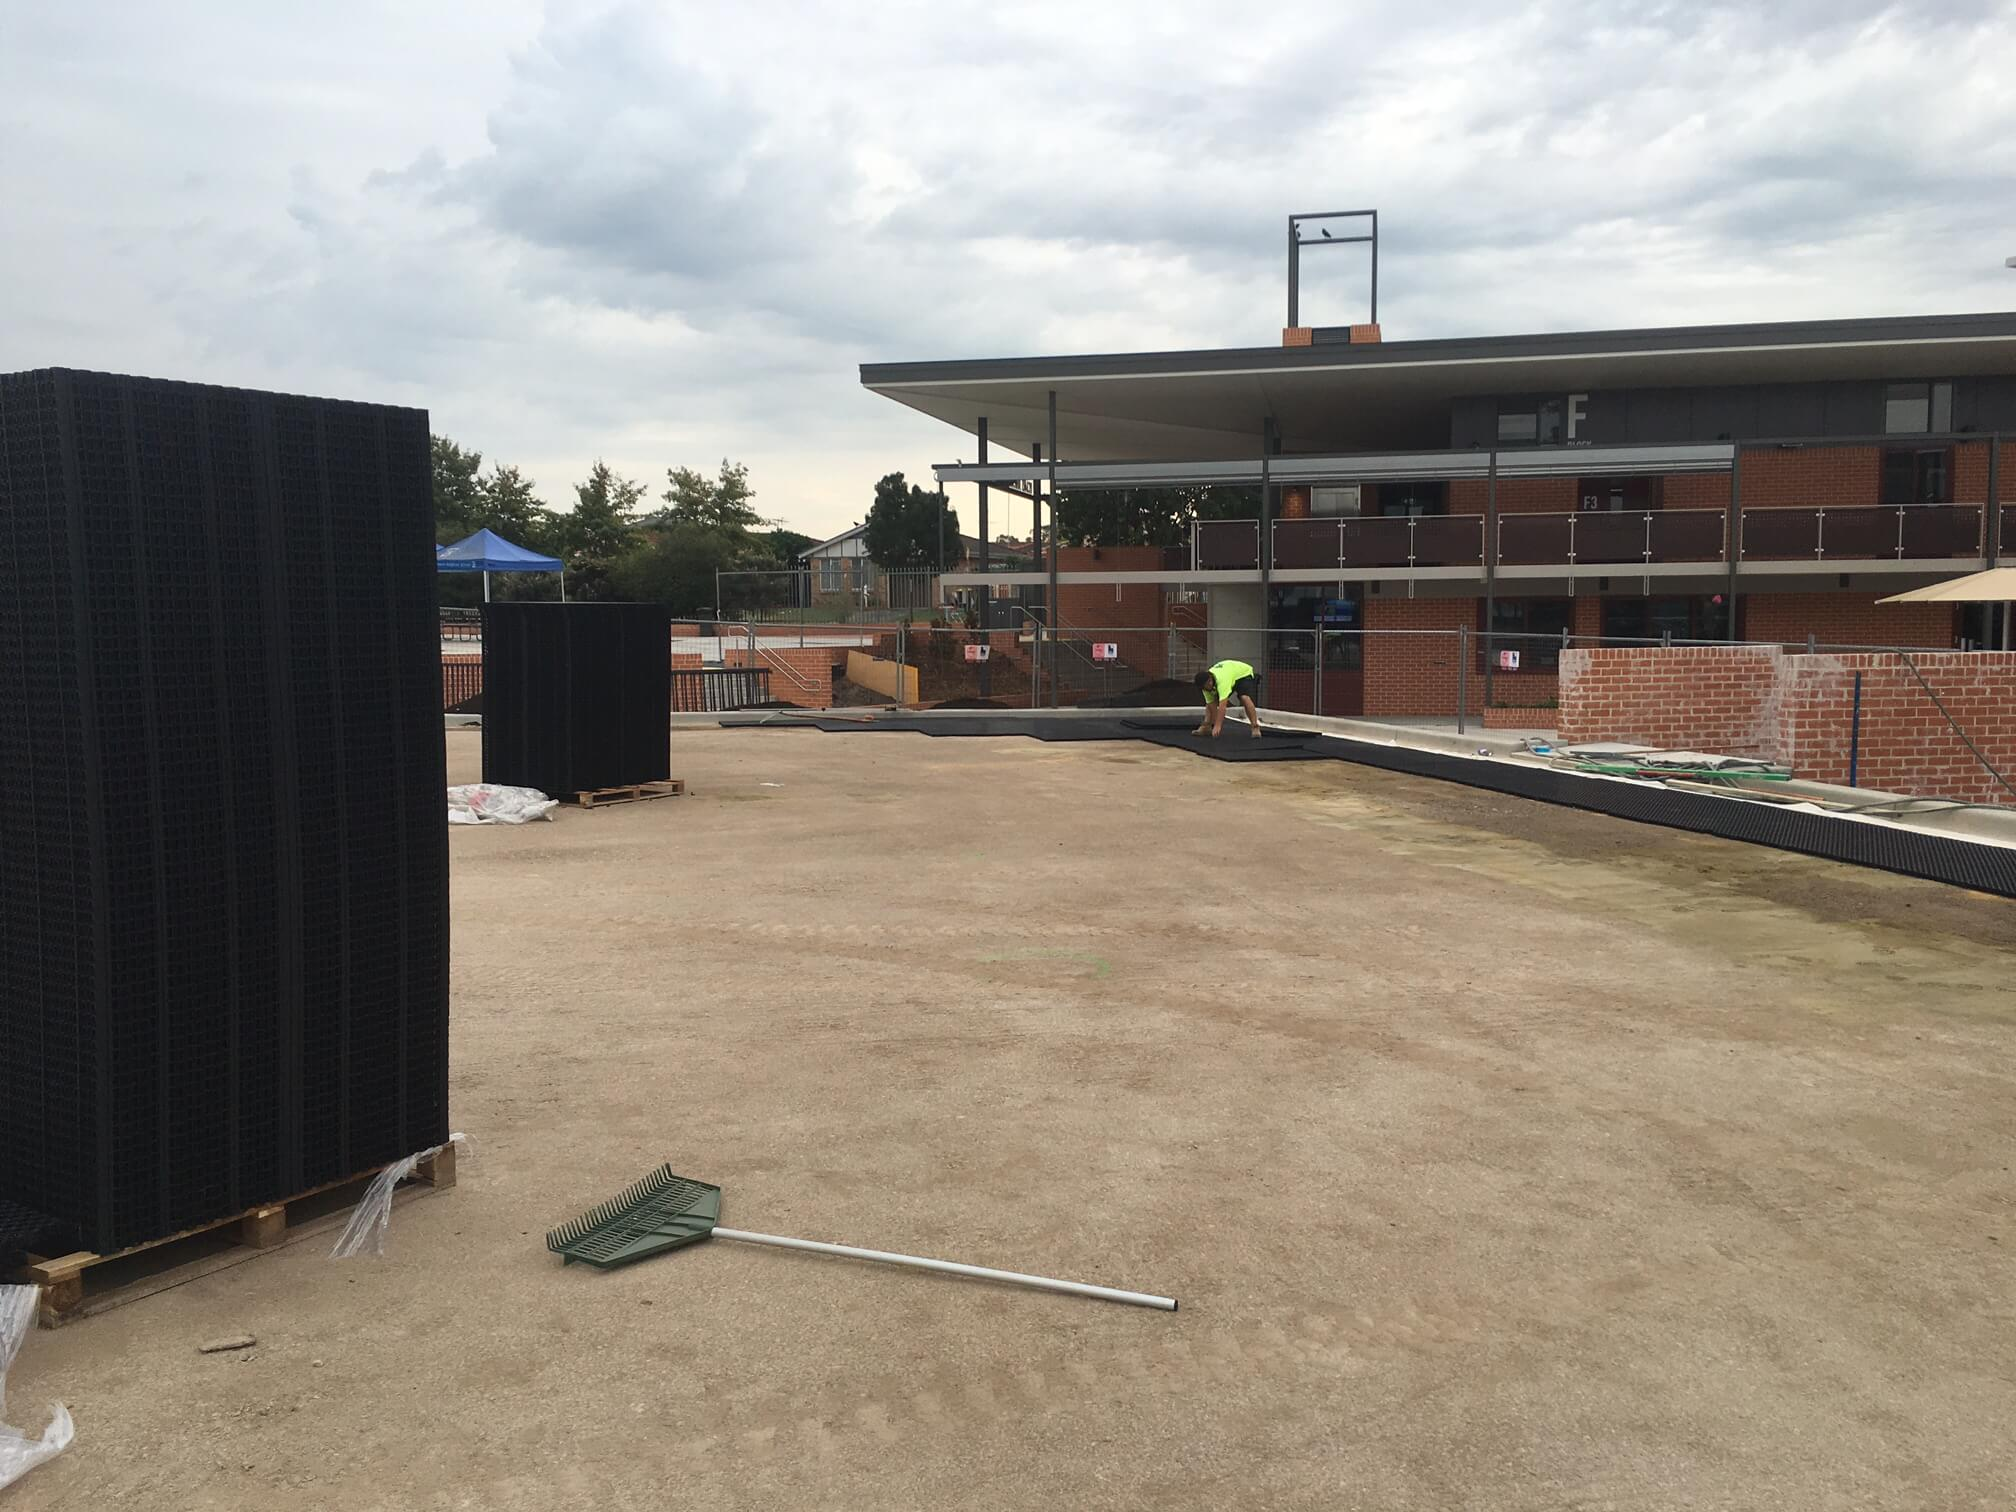 RJ Anglican School Futsal Court